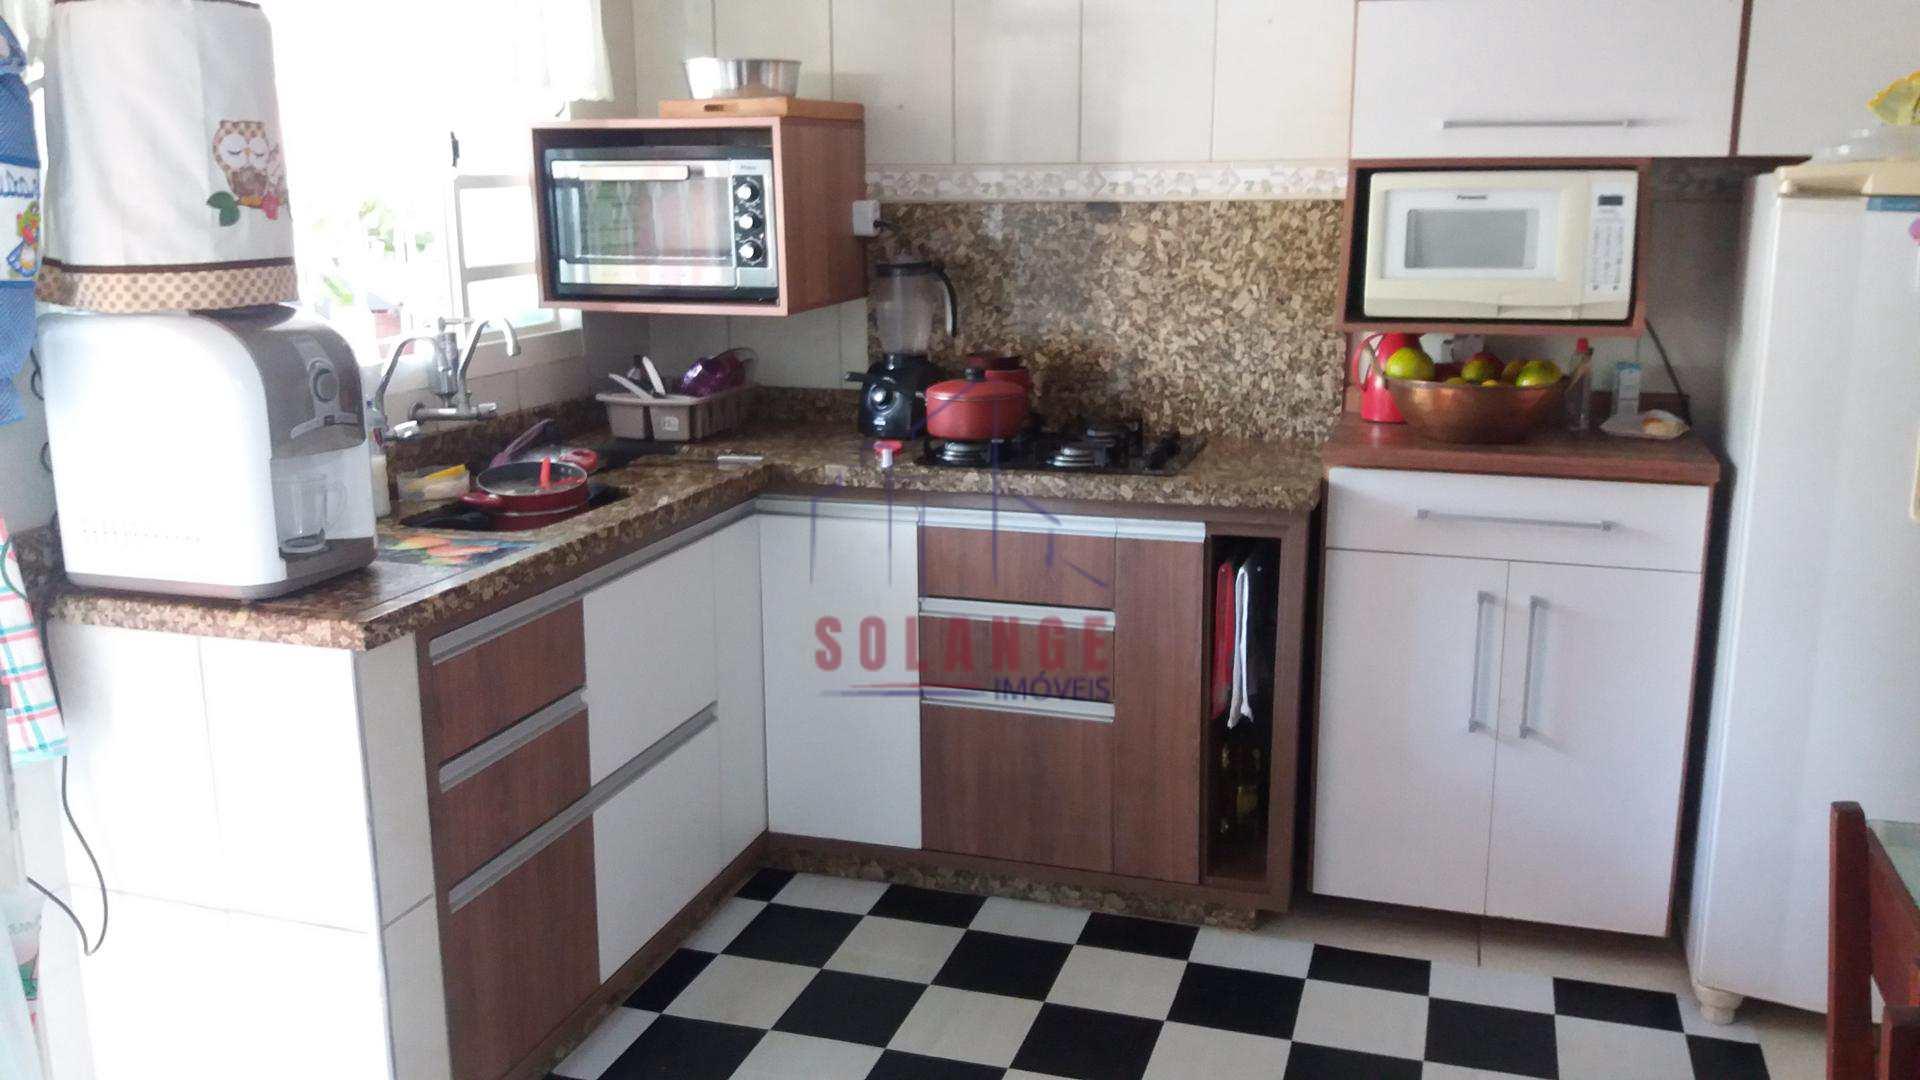 Casa com 2 dorms, Jardim Bianca, Amparo - R$ 300 mil, Cod: 2031